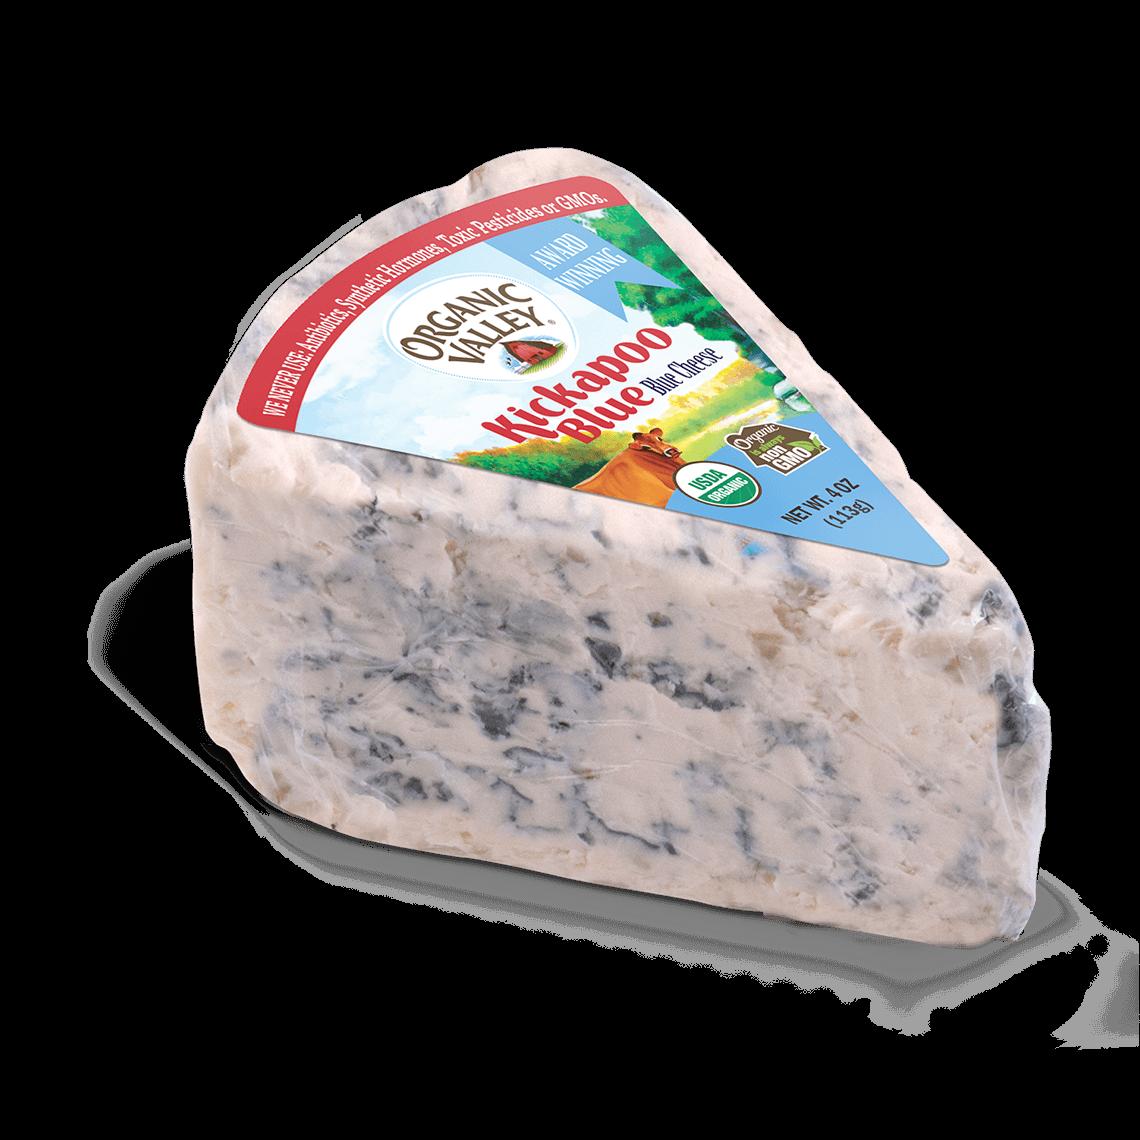 Kickapoo Blue Cheese Wedge, 4 oz